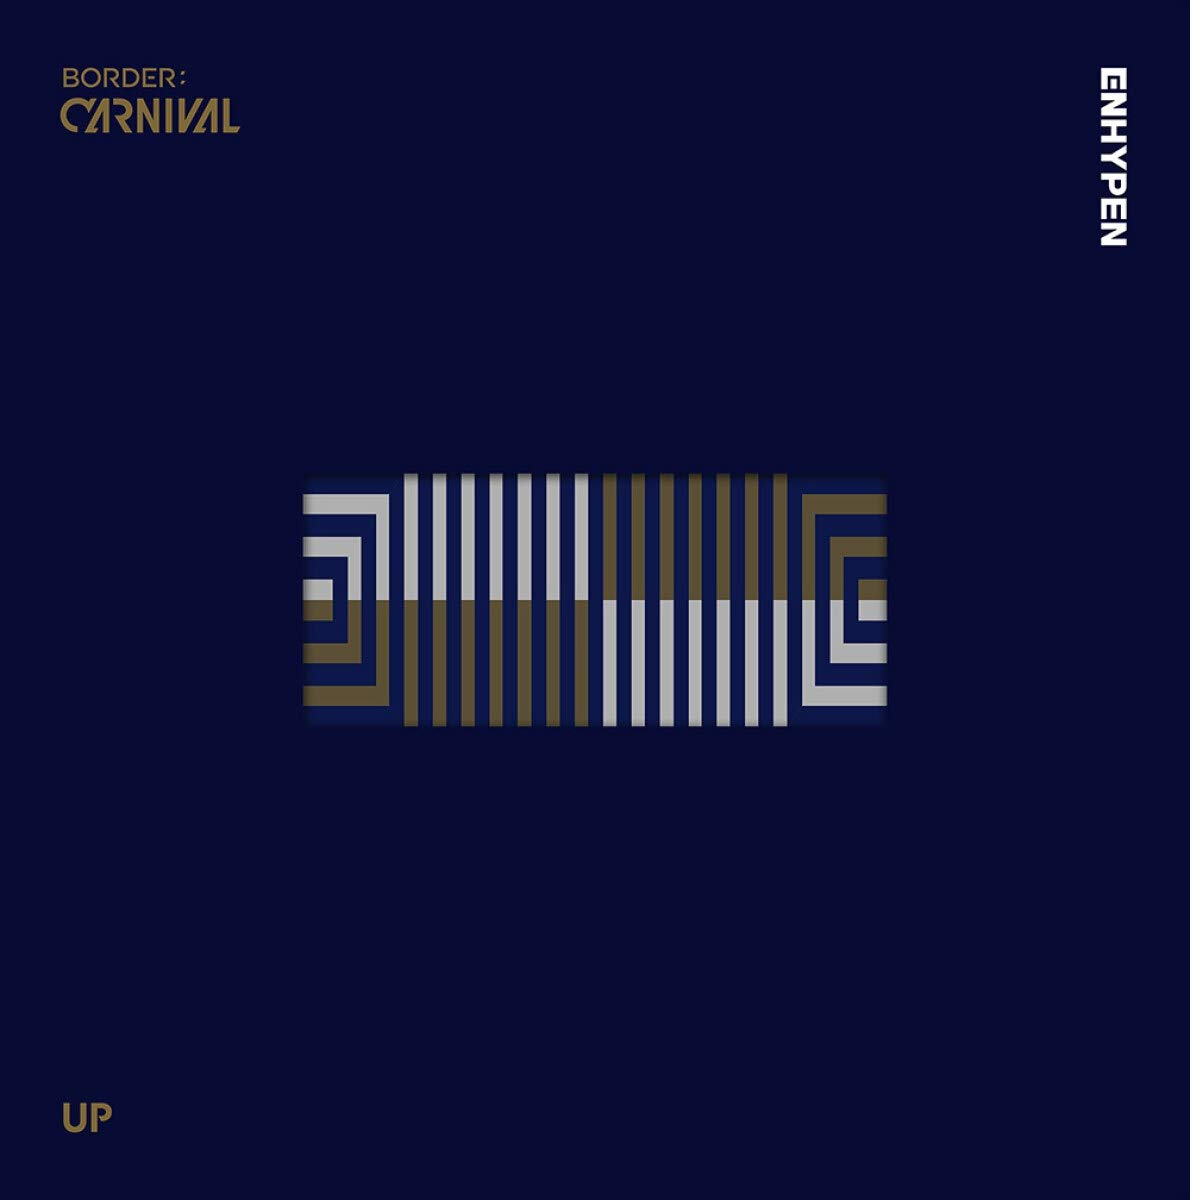 BORDER: CARNIVAL [UP Version] - ENHYPEN